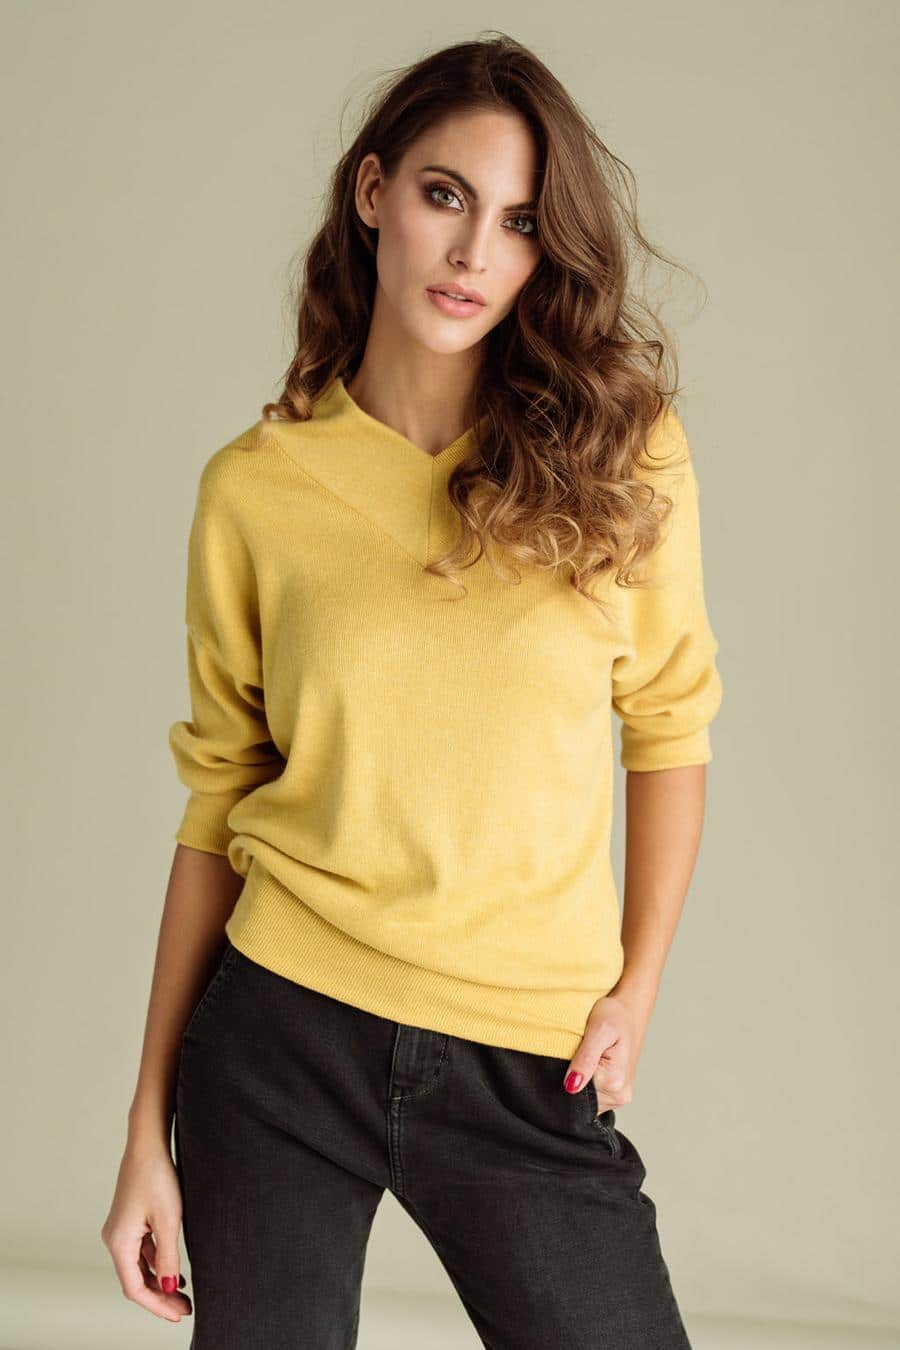 Jagger Zenska Bluza Kolekcija Prolece Leto Ss2021 Kupi Online Jg 9267 08 1 New